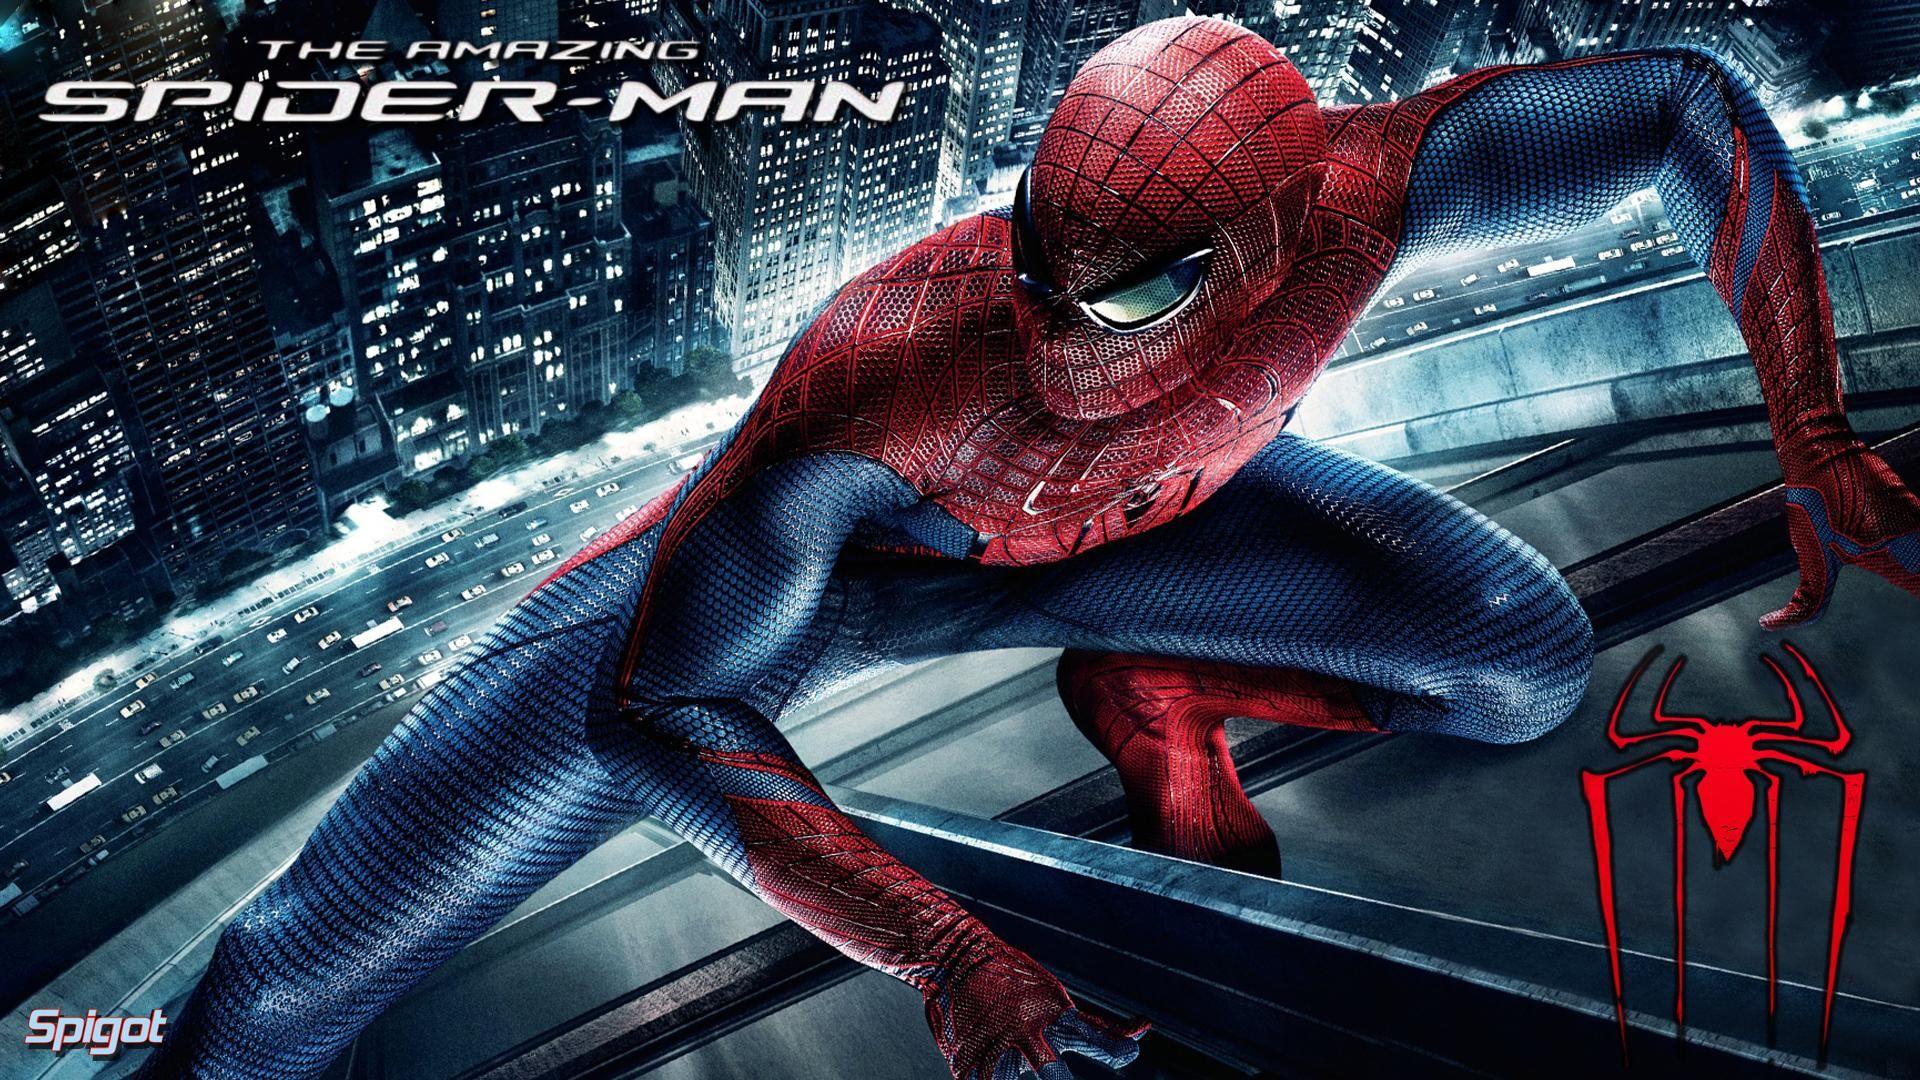 The Amazing Spider Man 2 Spiderman Amazing Spiderman Man Wallpaper